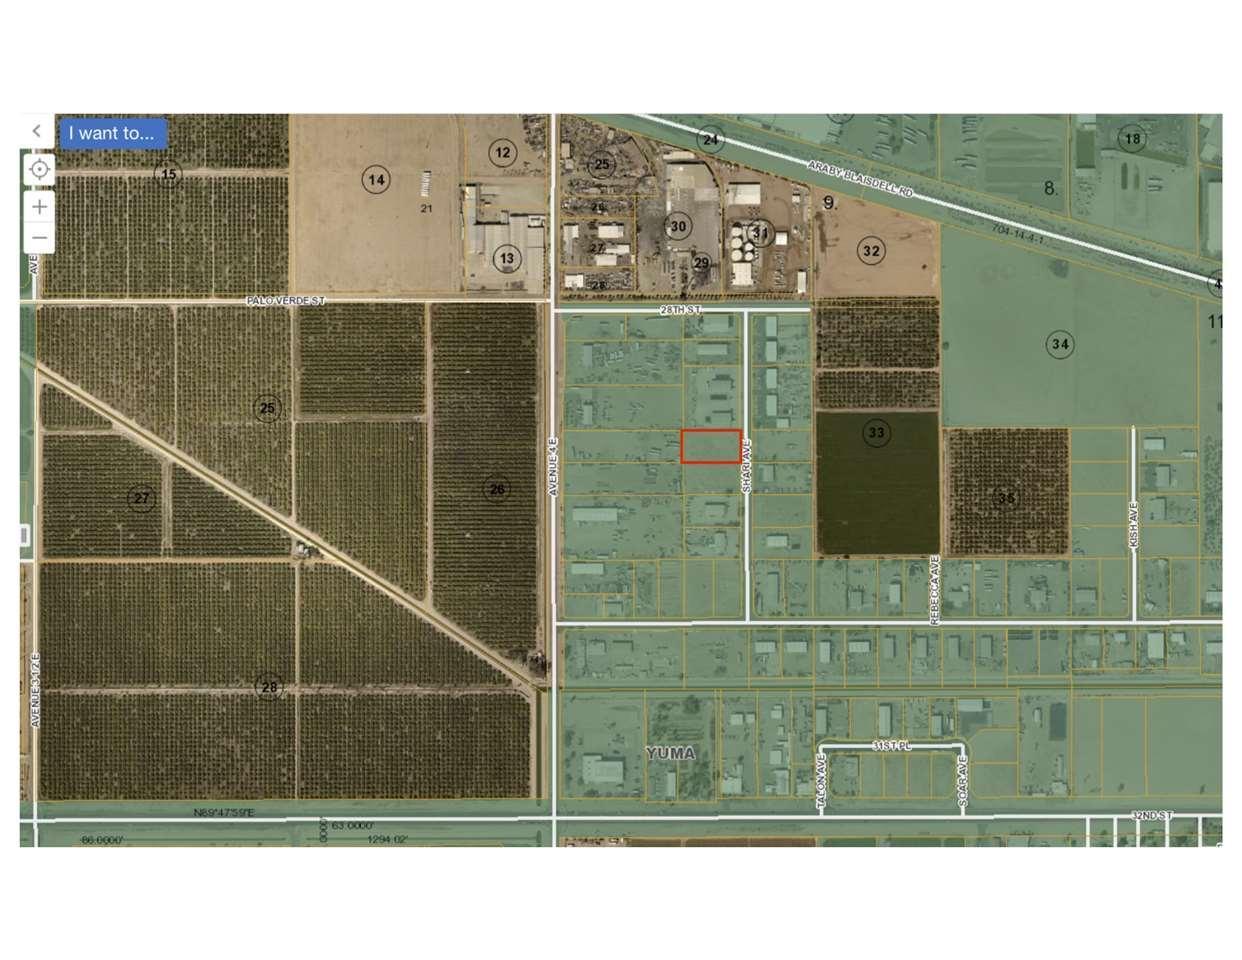 Industrial Property For Sale In Yuma Az